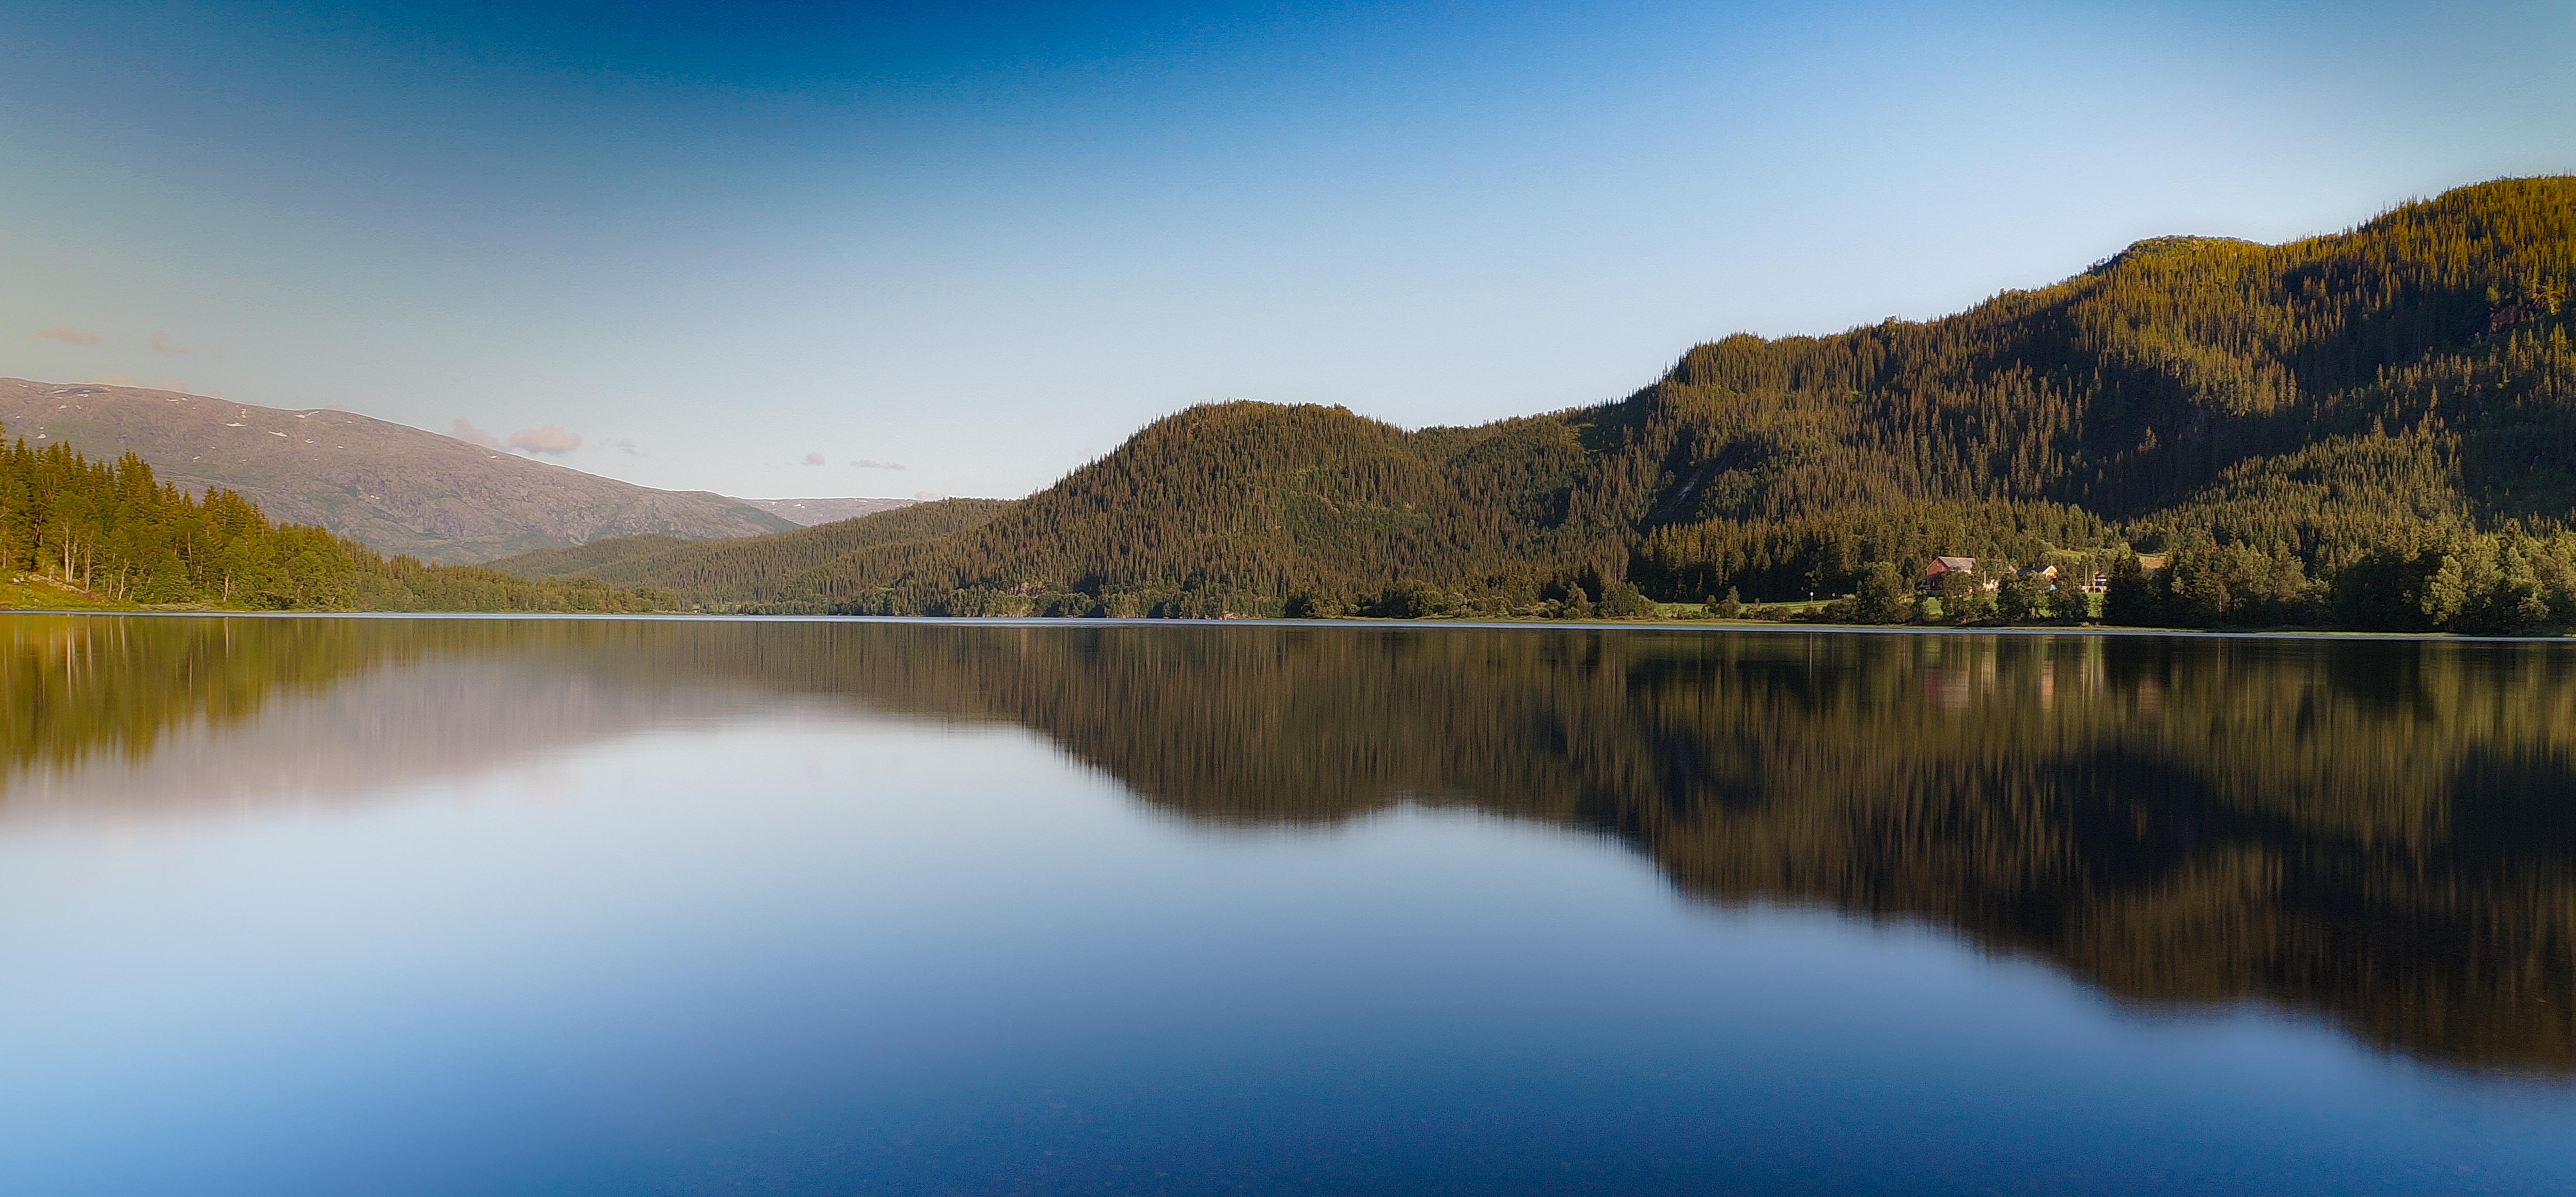 картинки панорама озера машин оказались почти